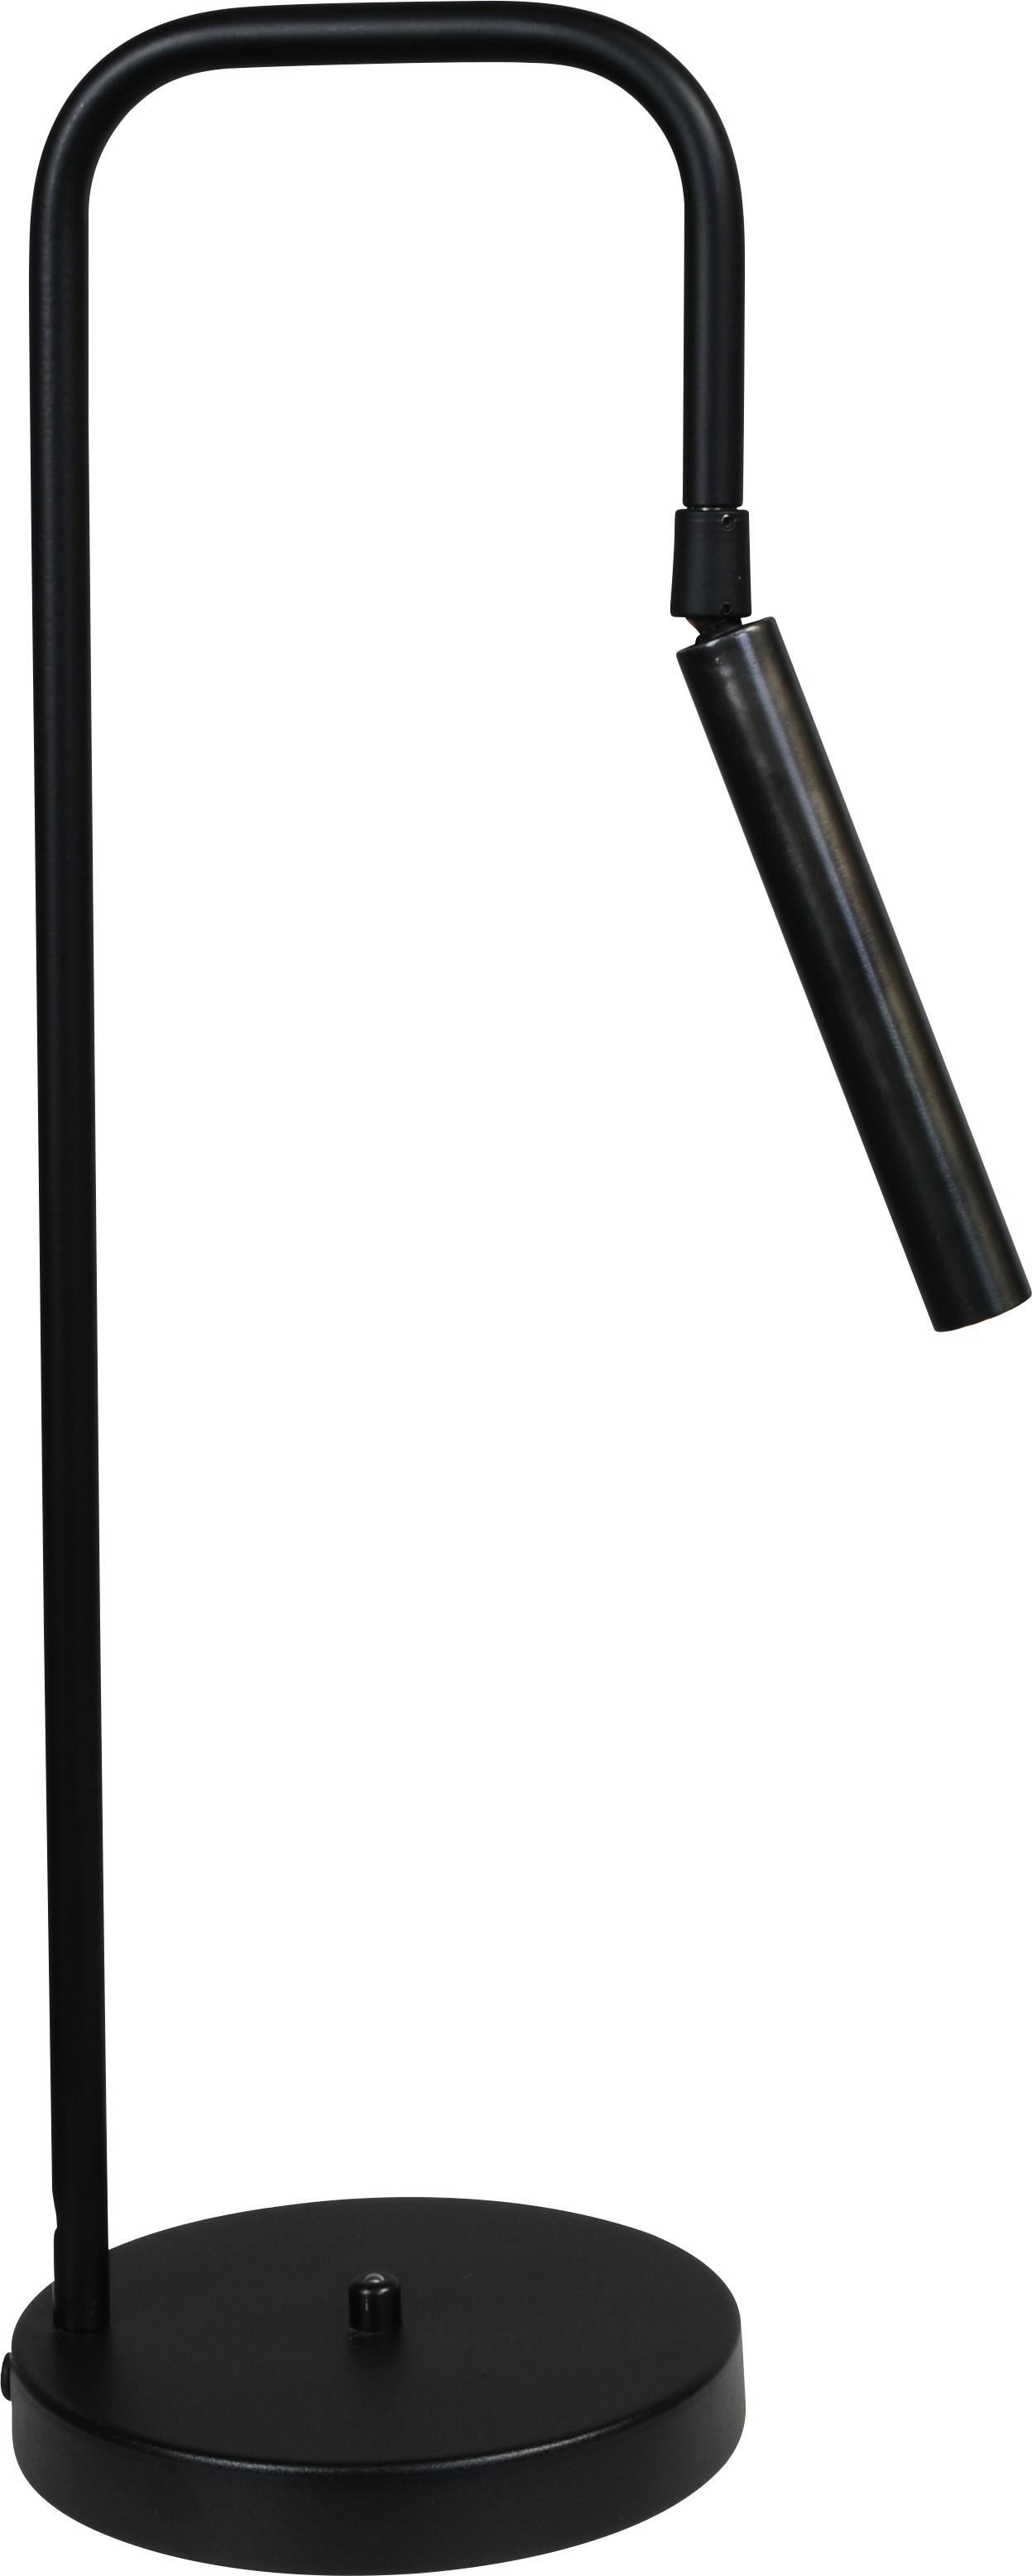 Flute TL FLUTE 1LTS BLACK/DAPPLED OIL H.52CM